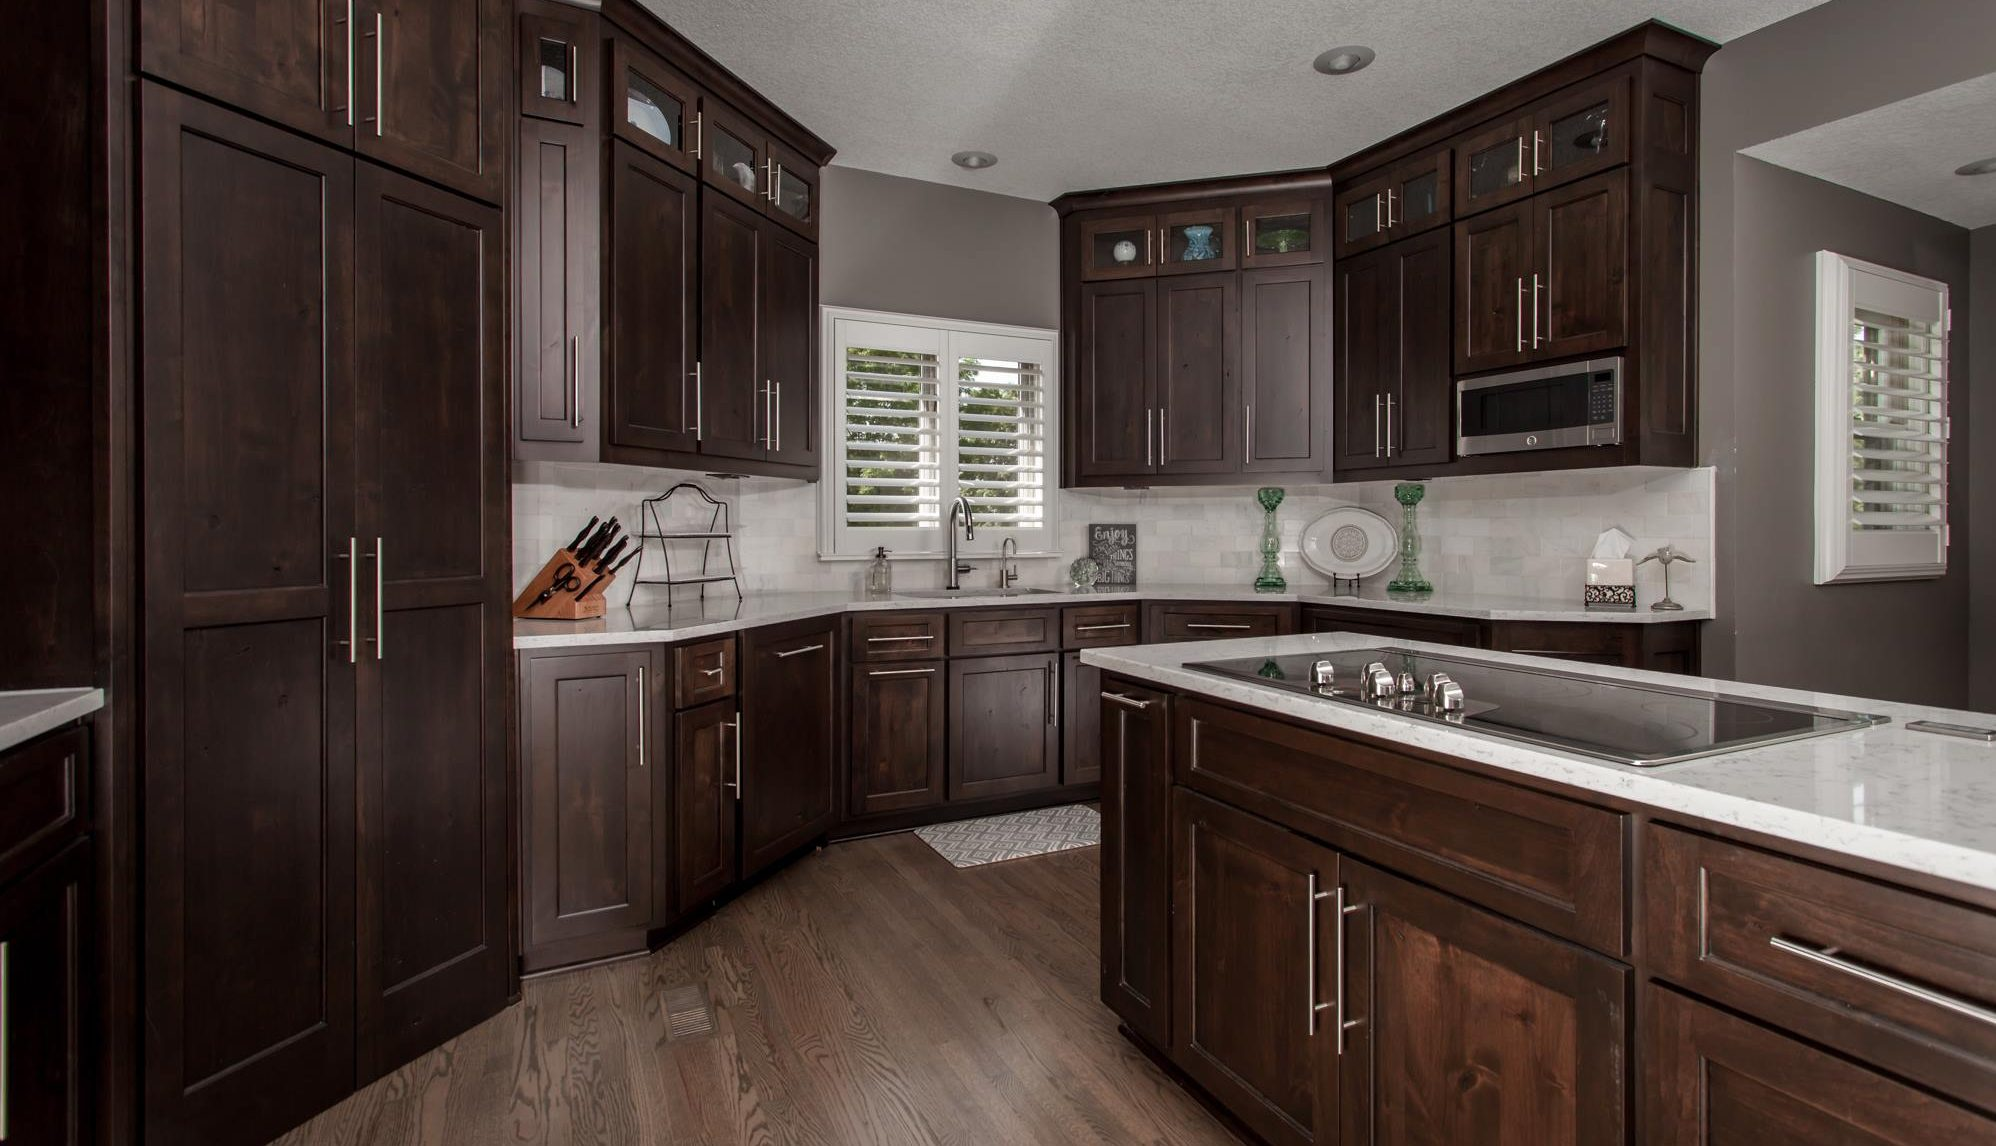 cabinets countertops island